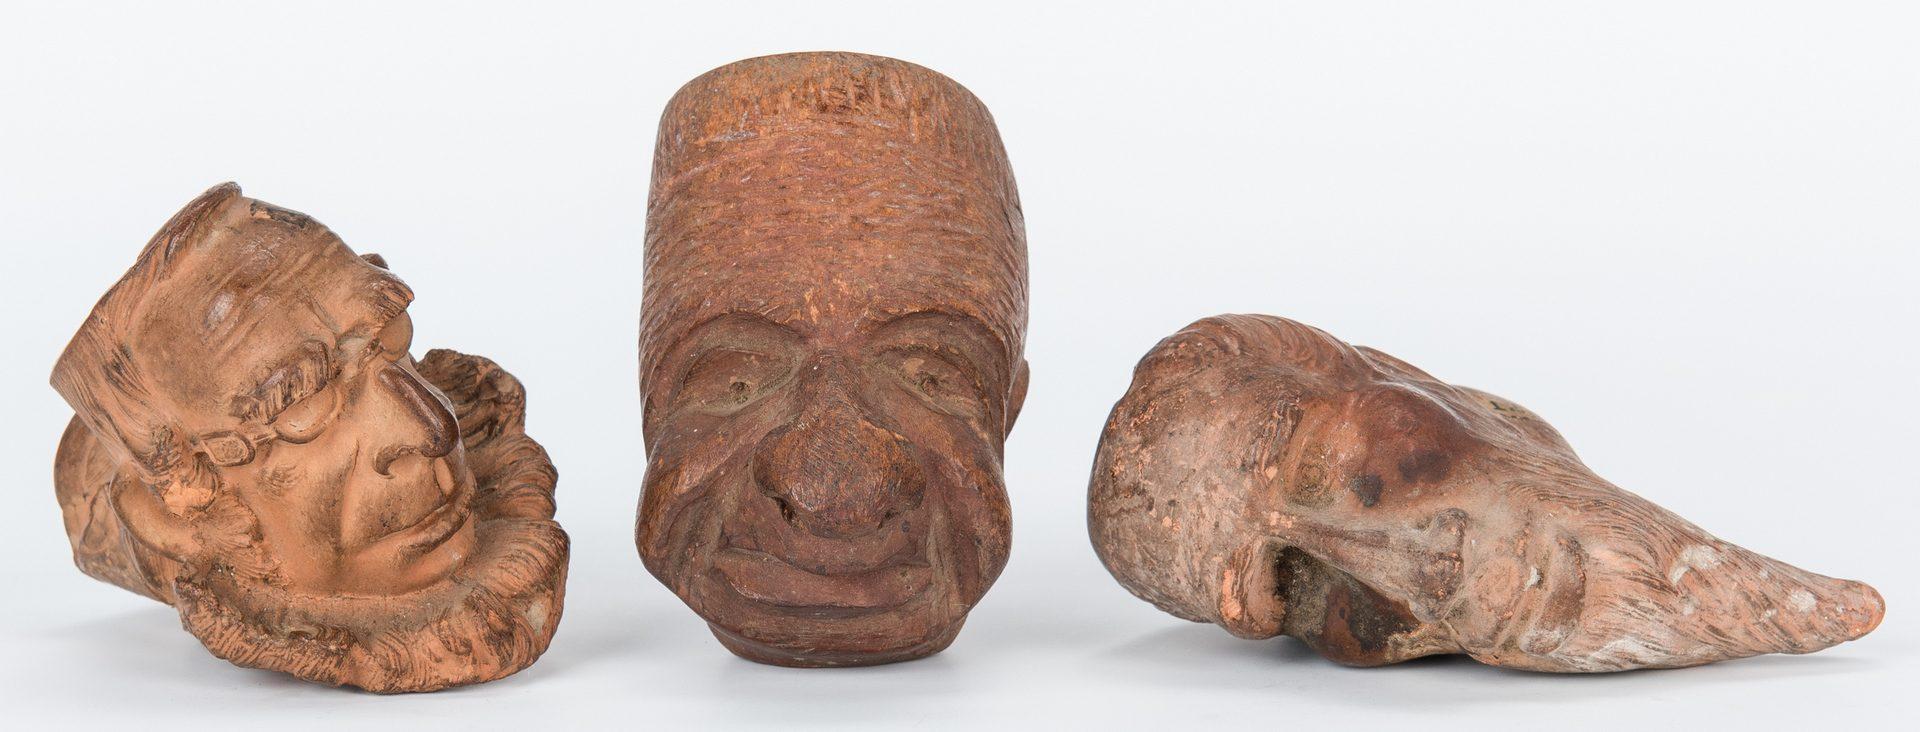 Lot 585: 3 Figural Pipe Bowls, incl. Payrau